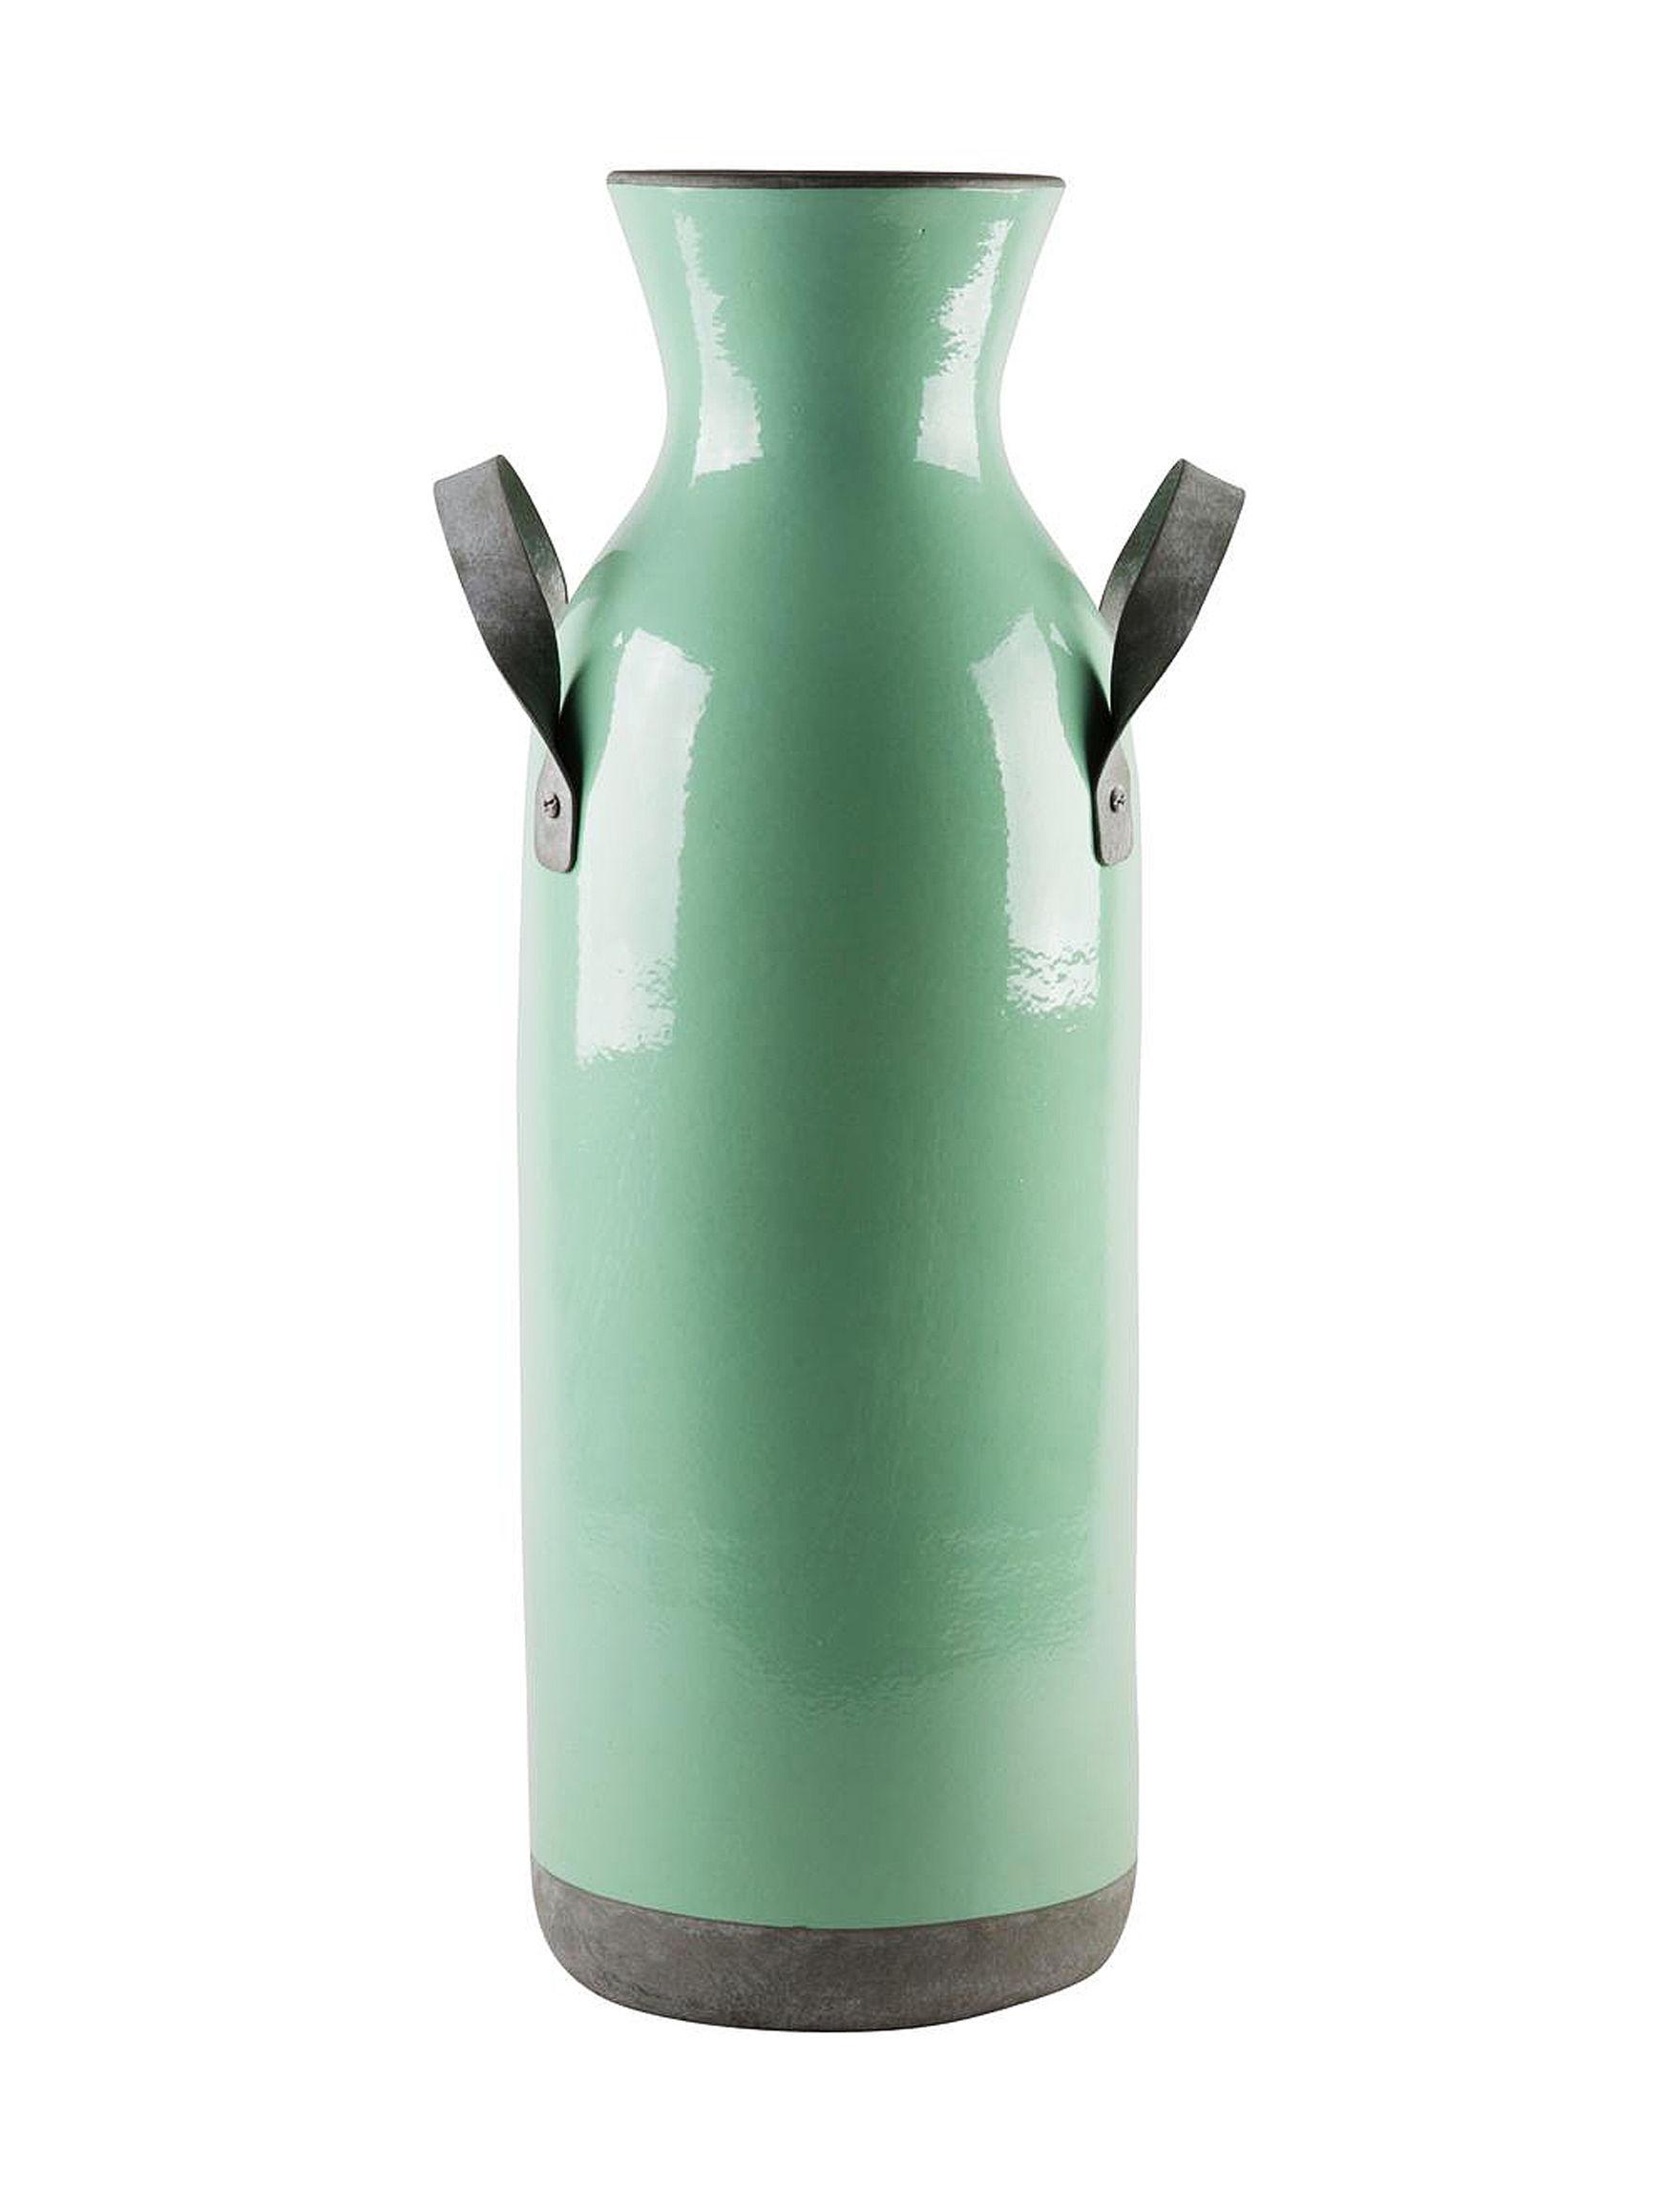 Home Essentials Sage Vases & Decorative Bowls Home Accents